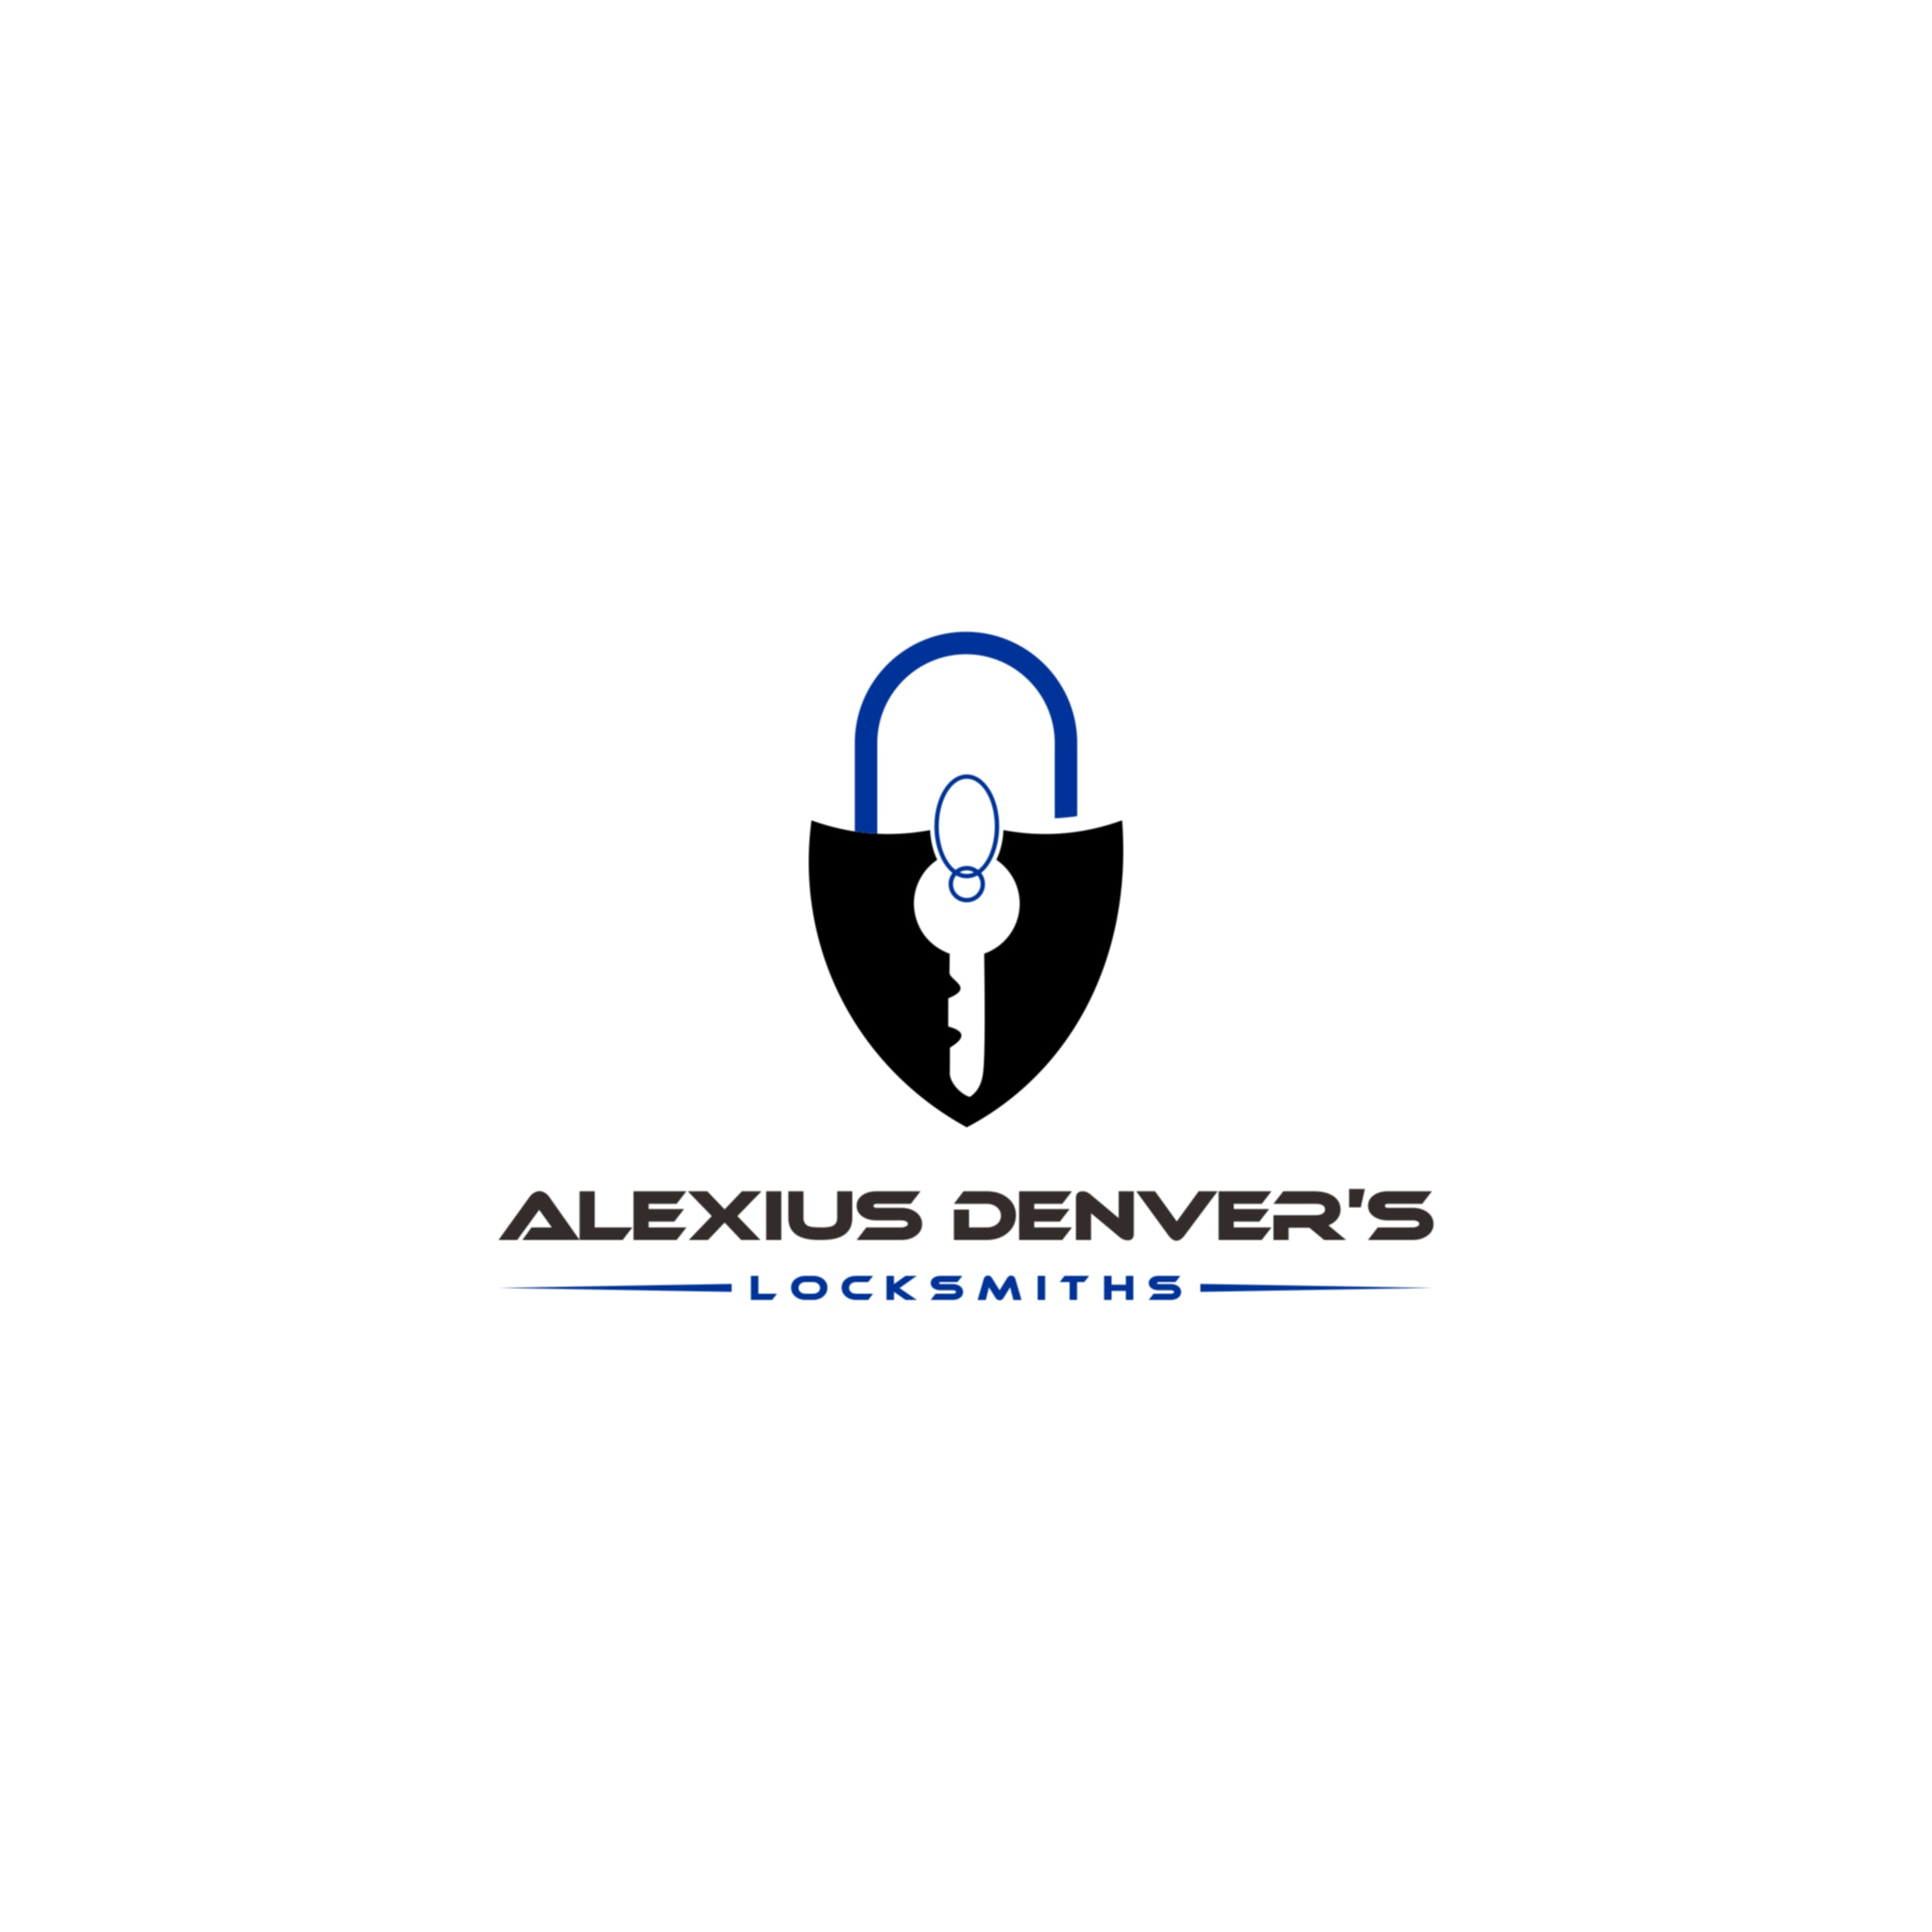 Alexius Denver's Lockmsiths